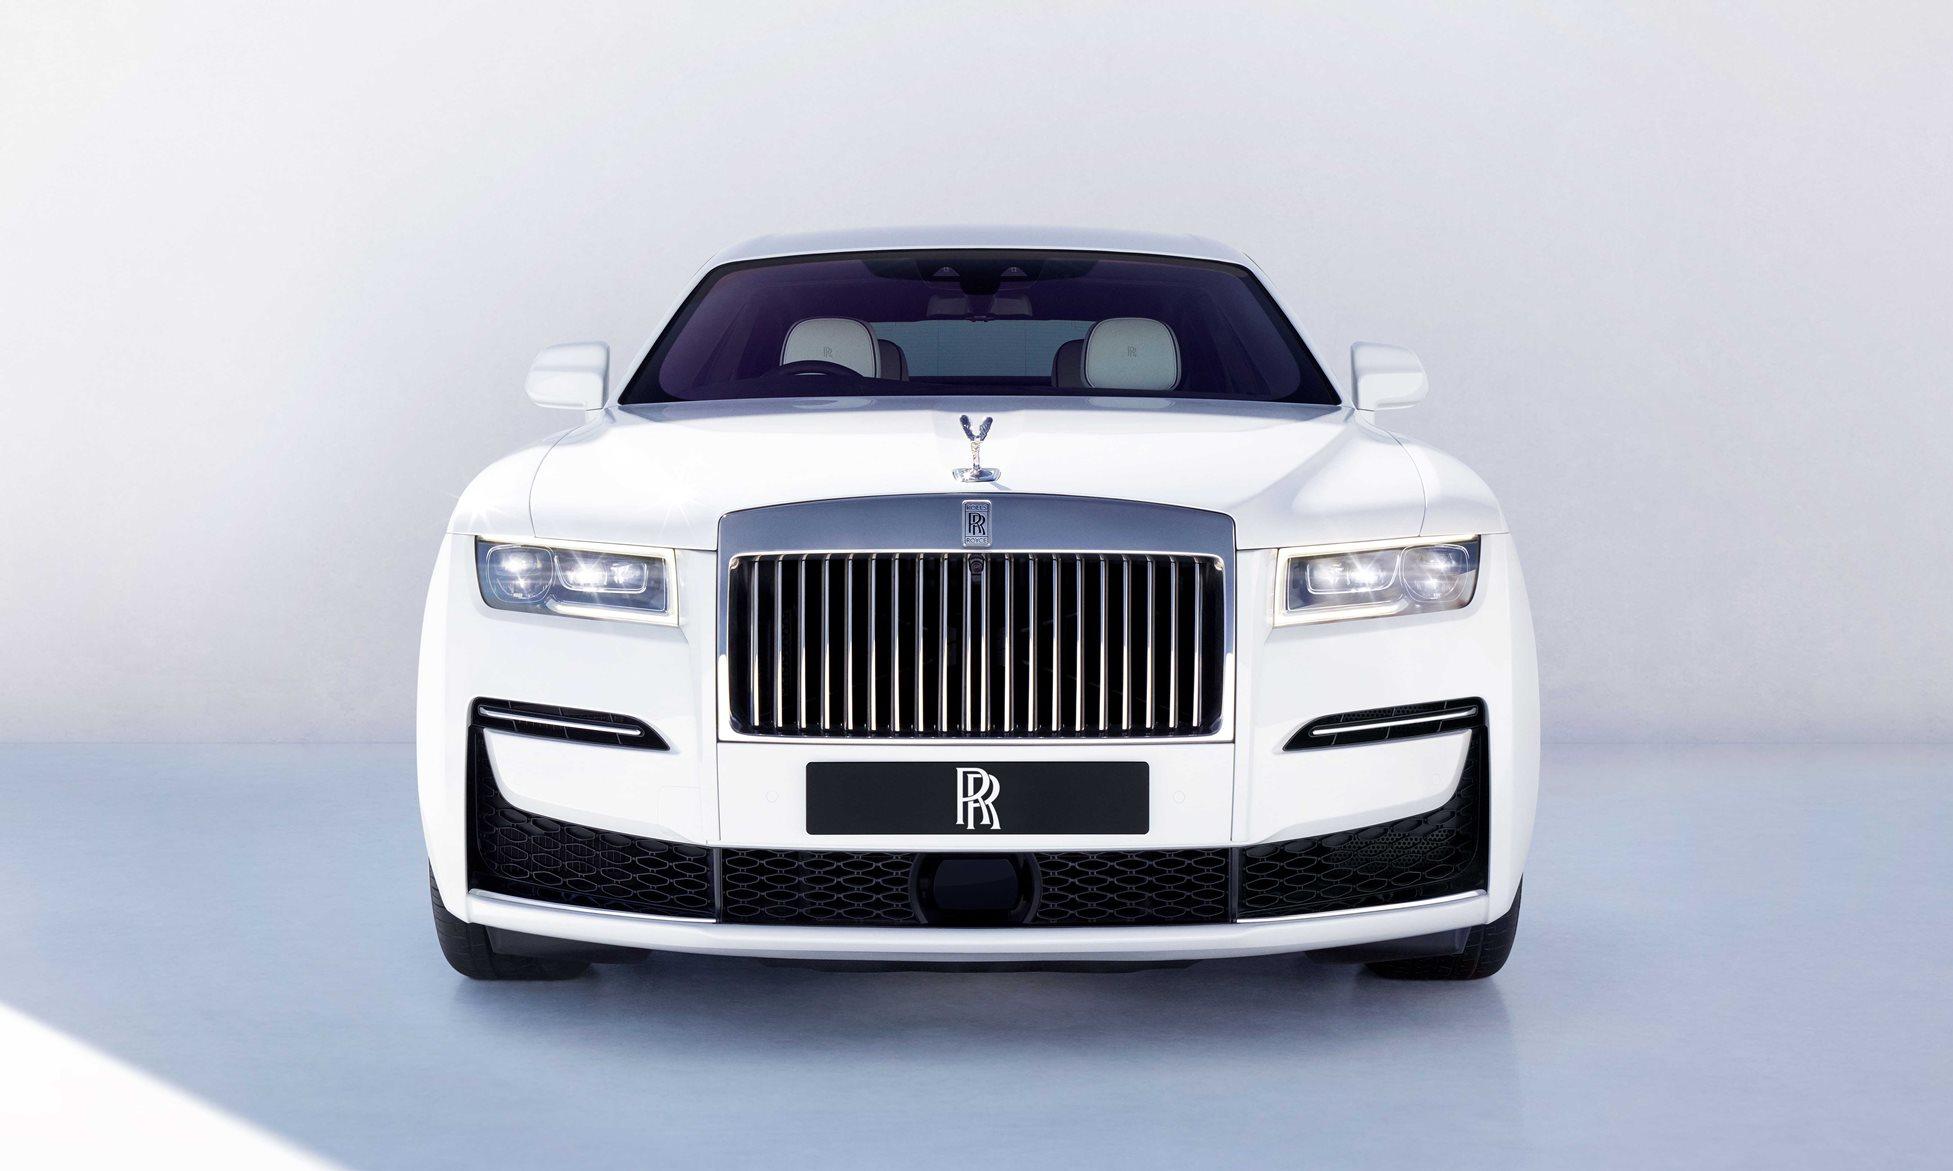 Rolls Royce Ghost front